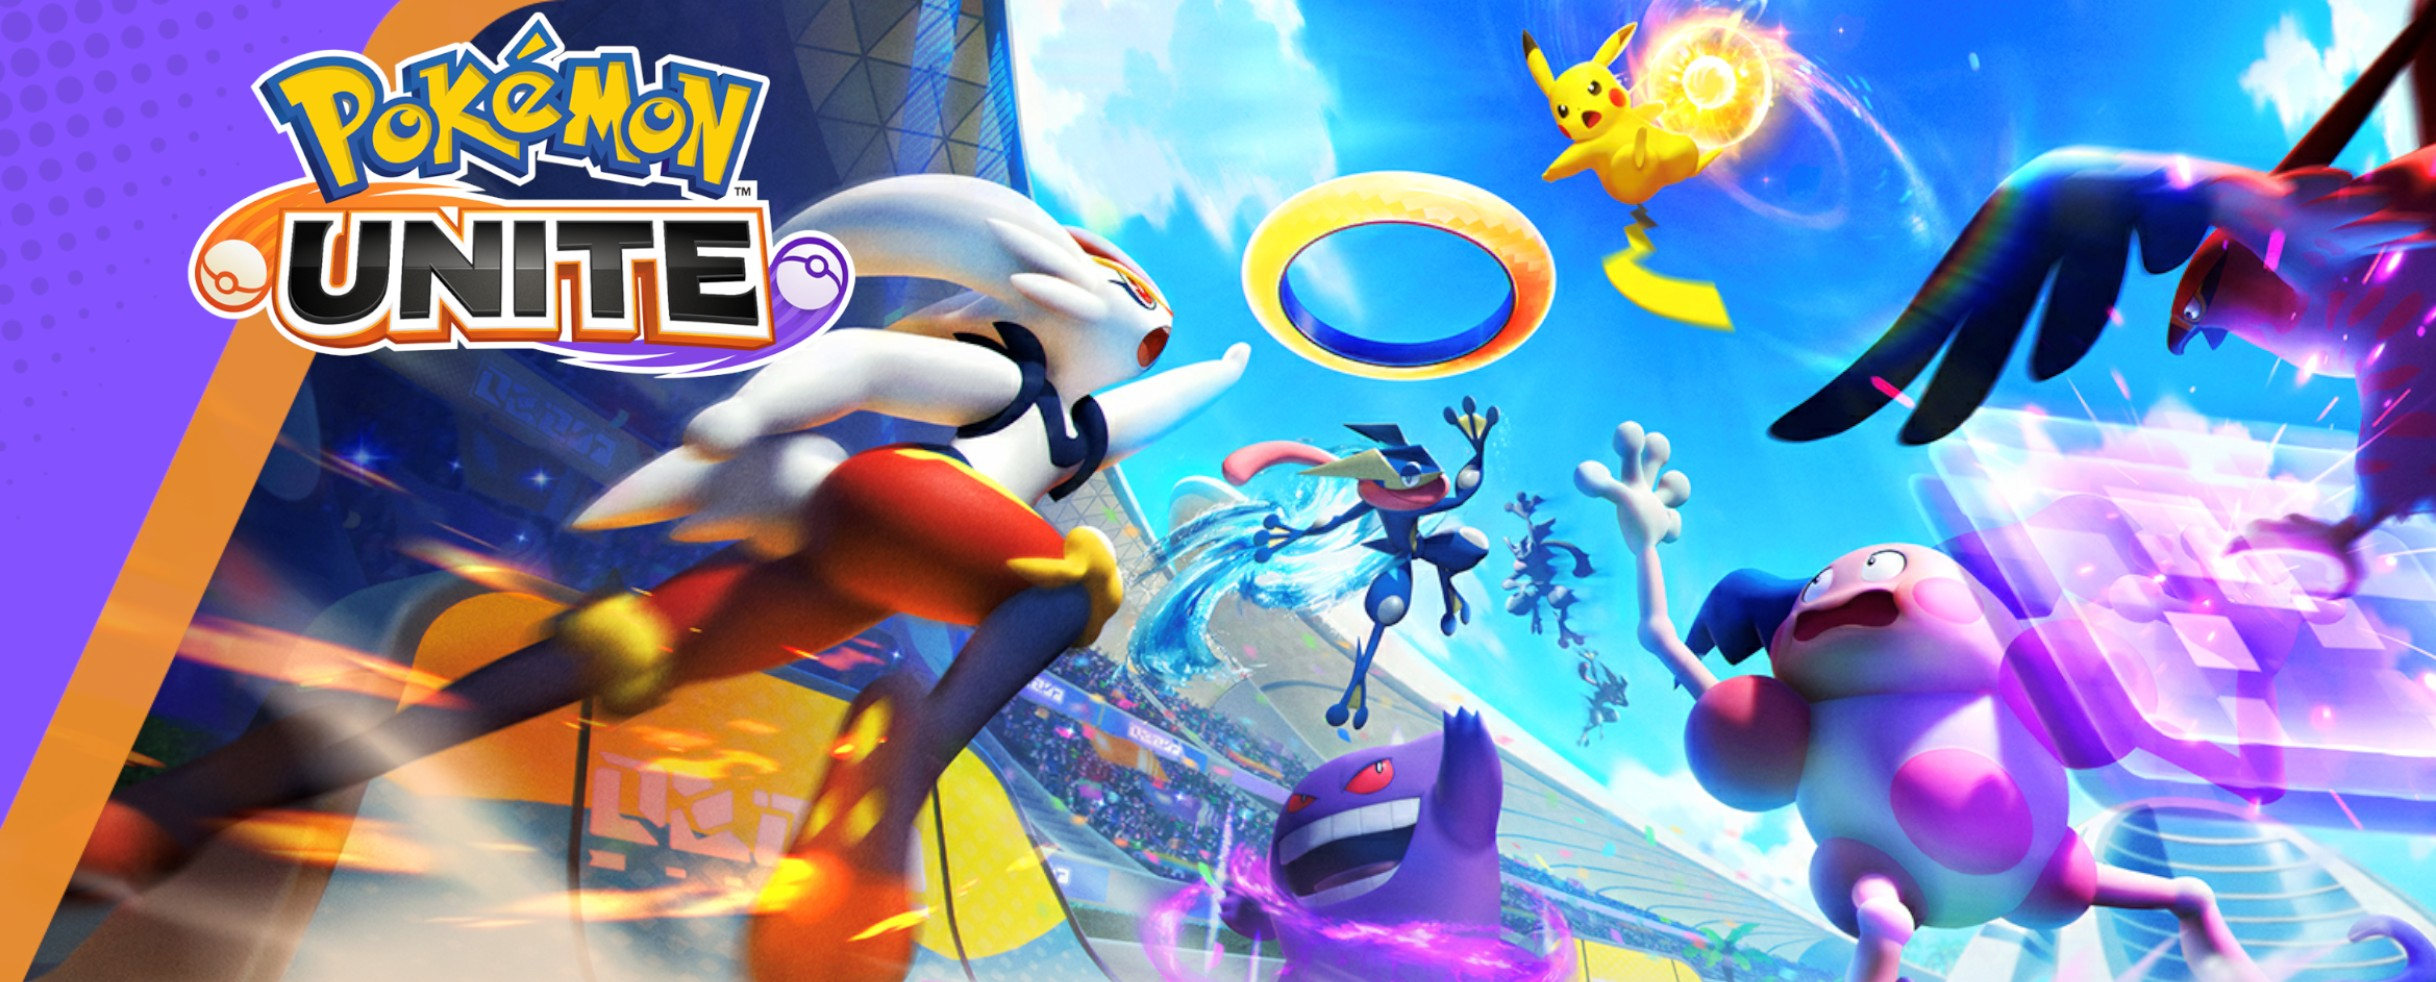 Pokemon Unite - fot. Tabletowo.pl